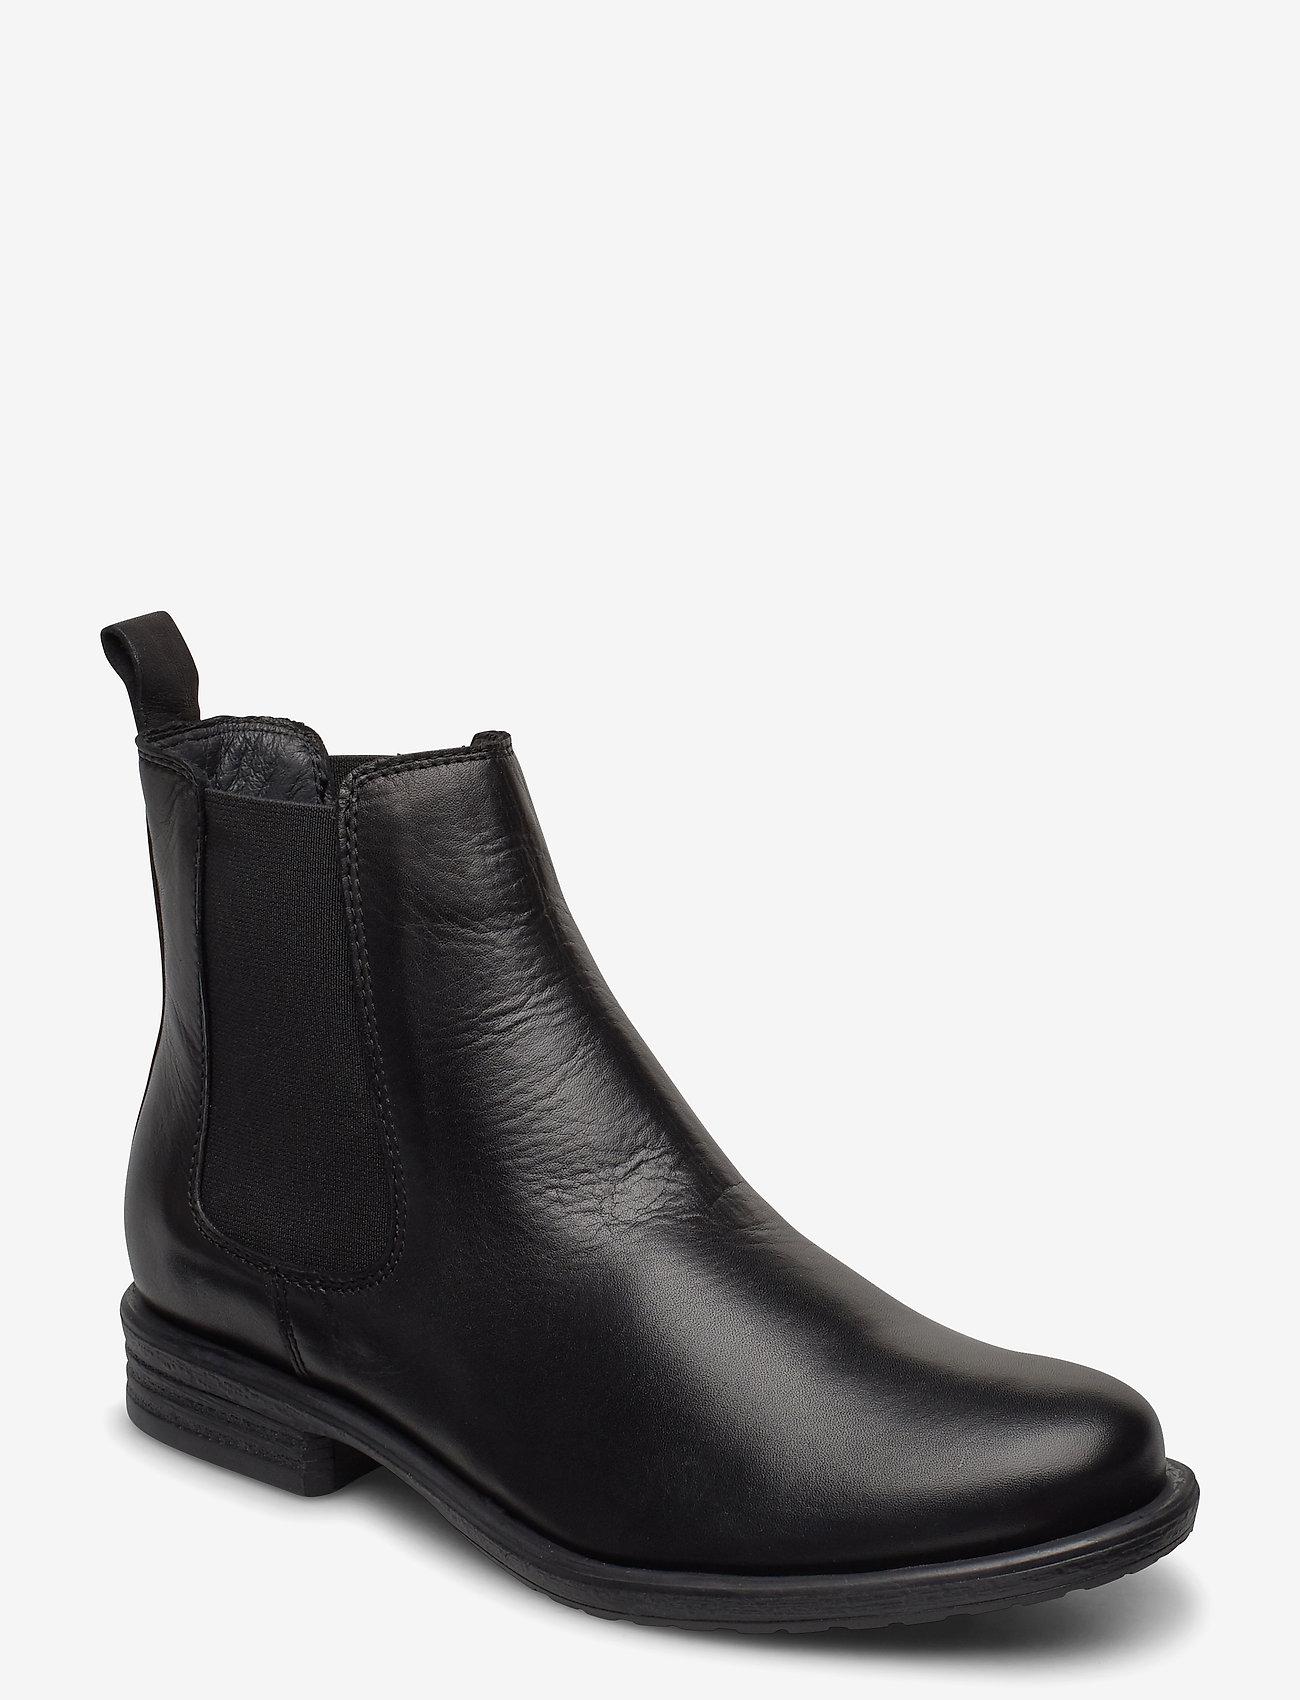 Biadanelle chelsea boots   BIANCO